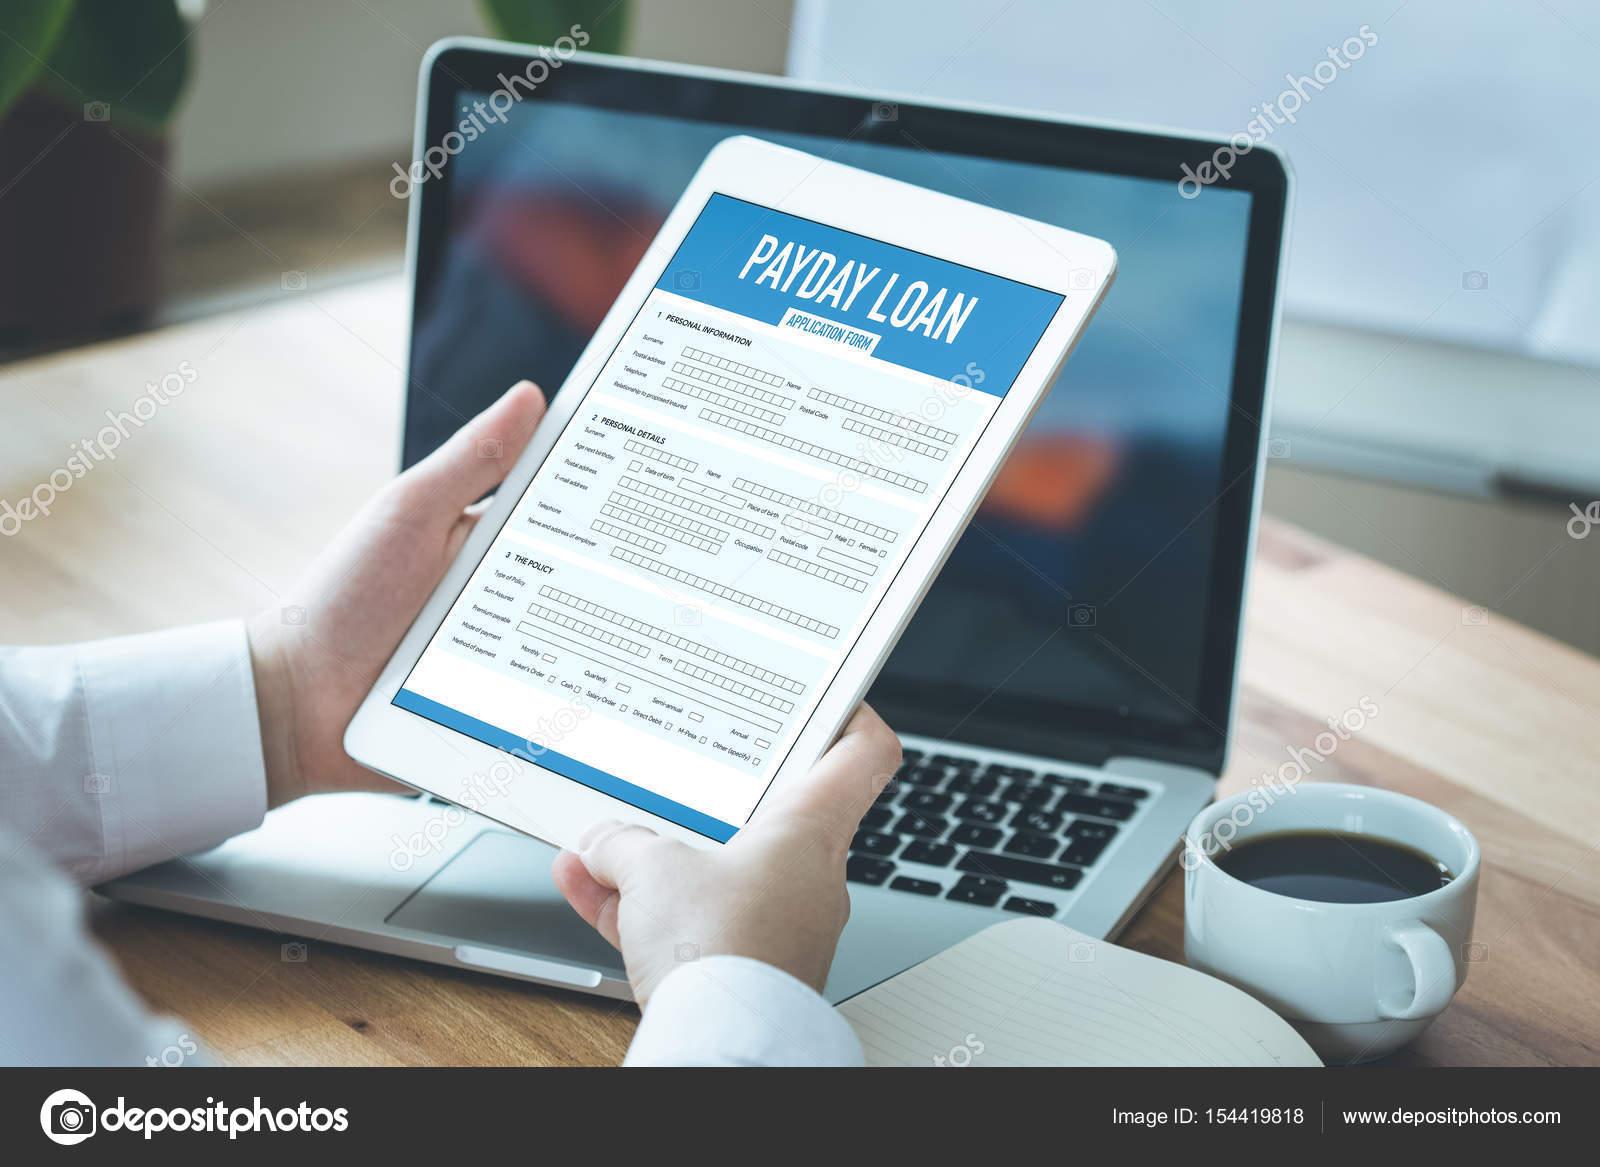 Installment payment photo 2